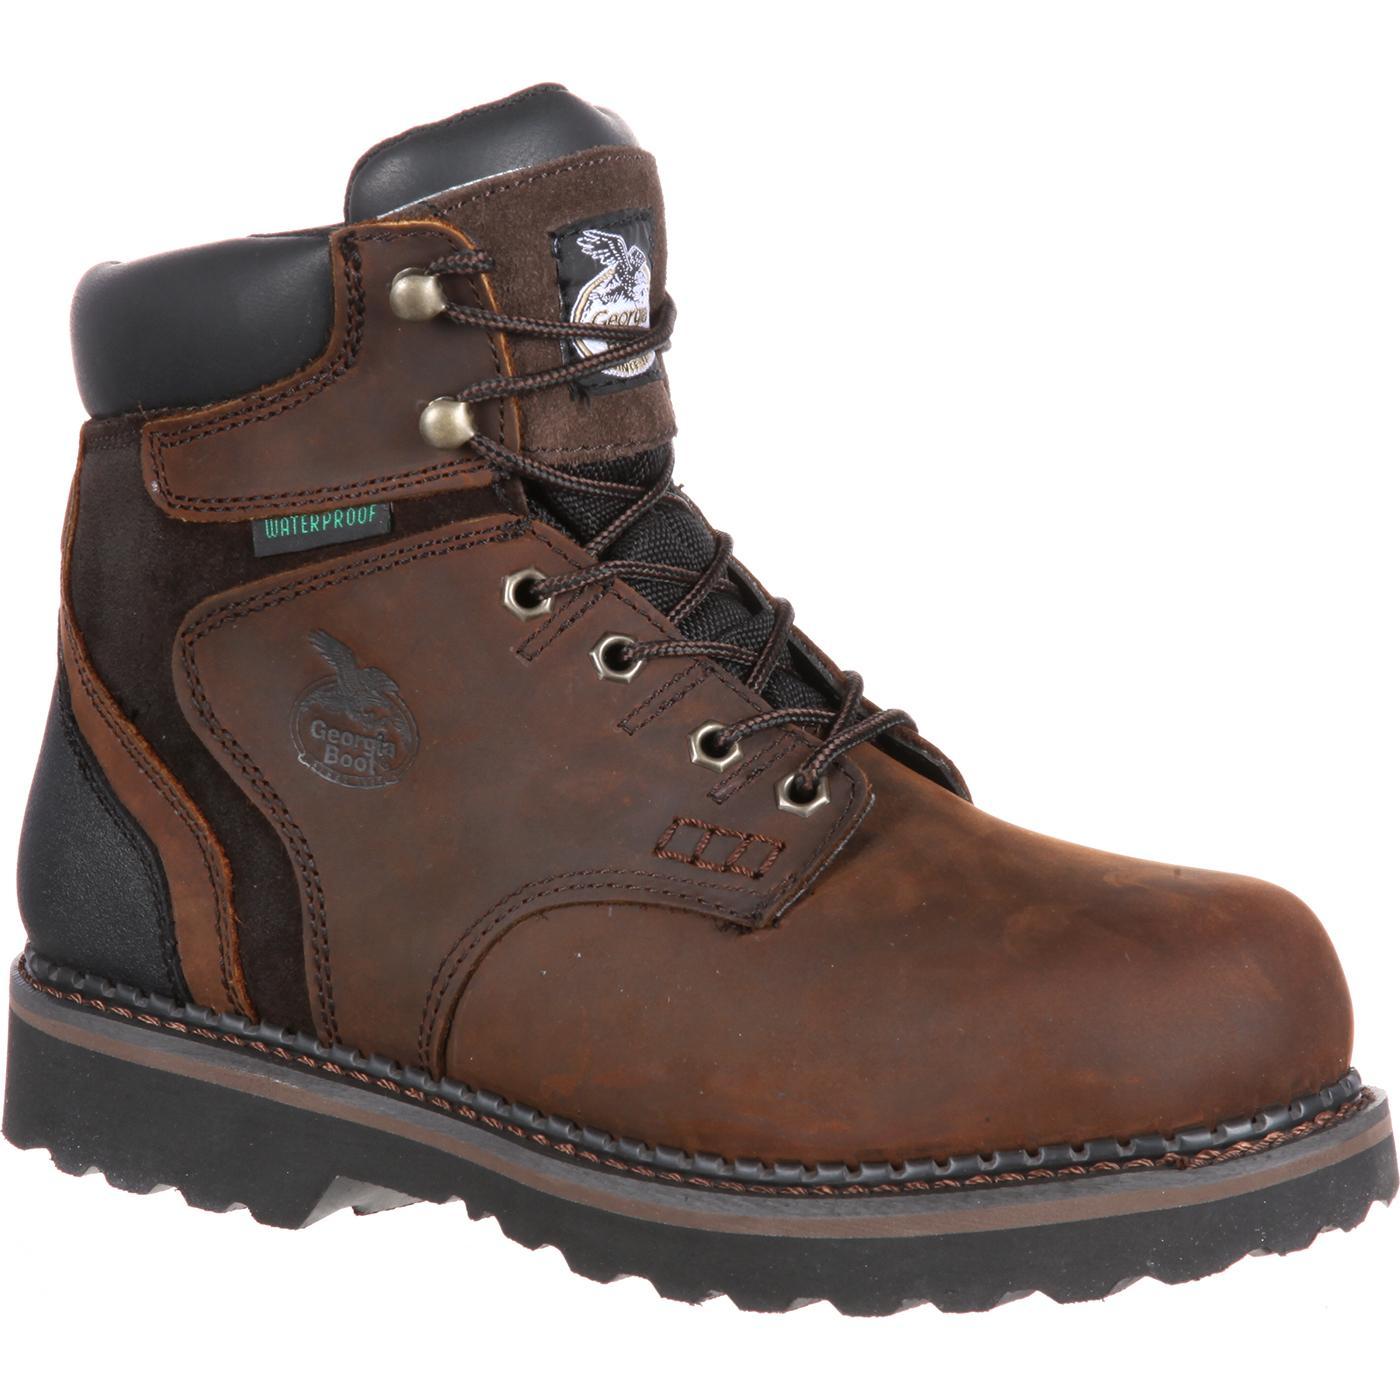 Keen Boots Wide Width